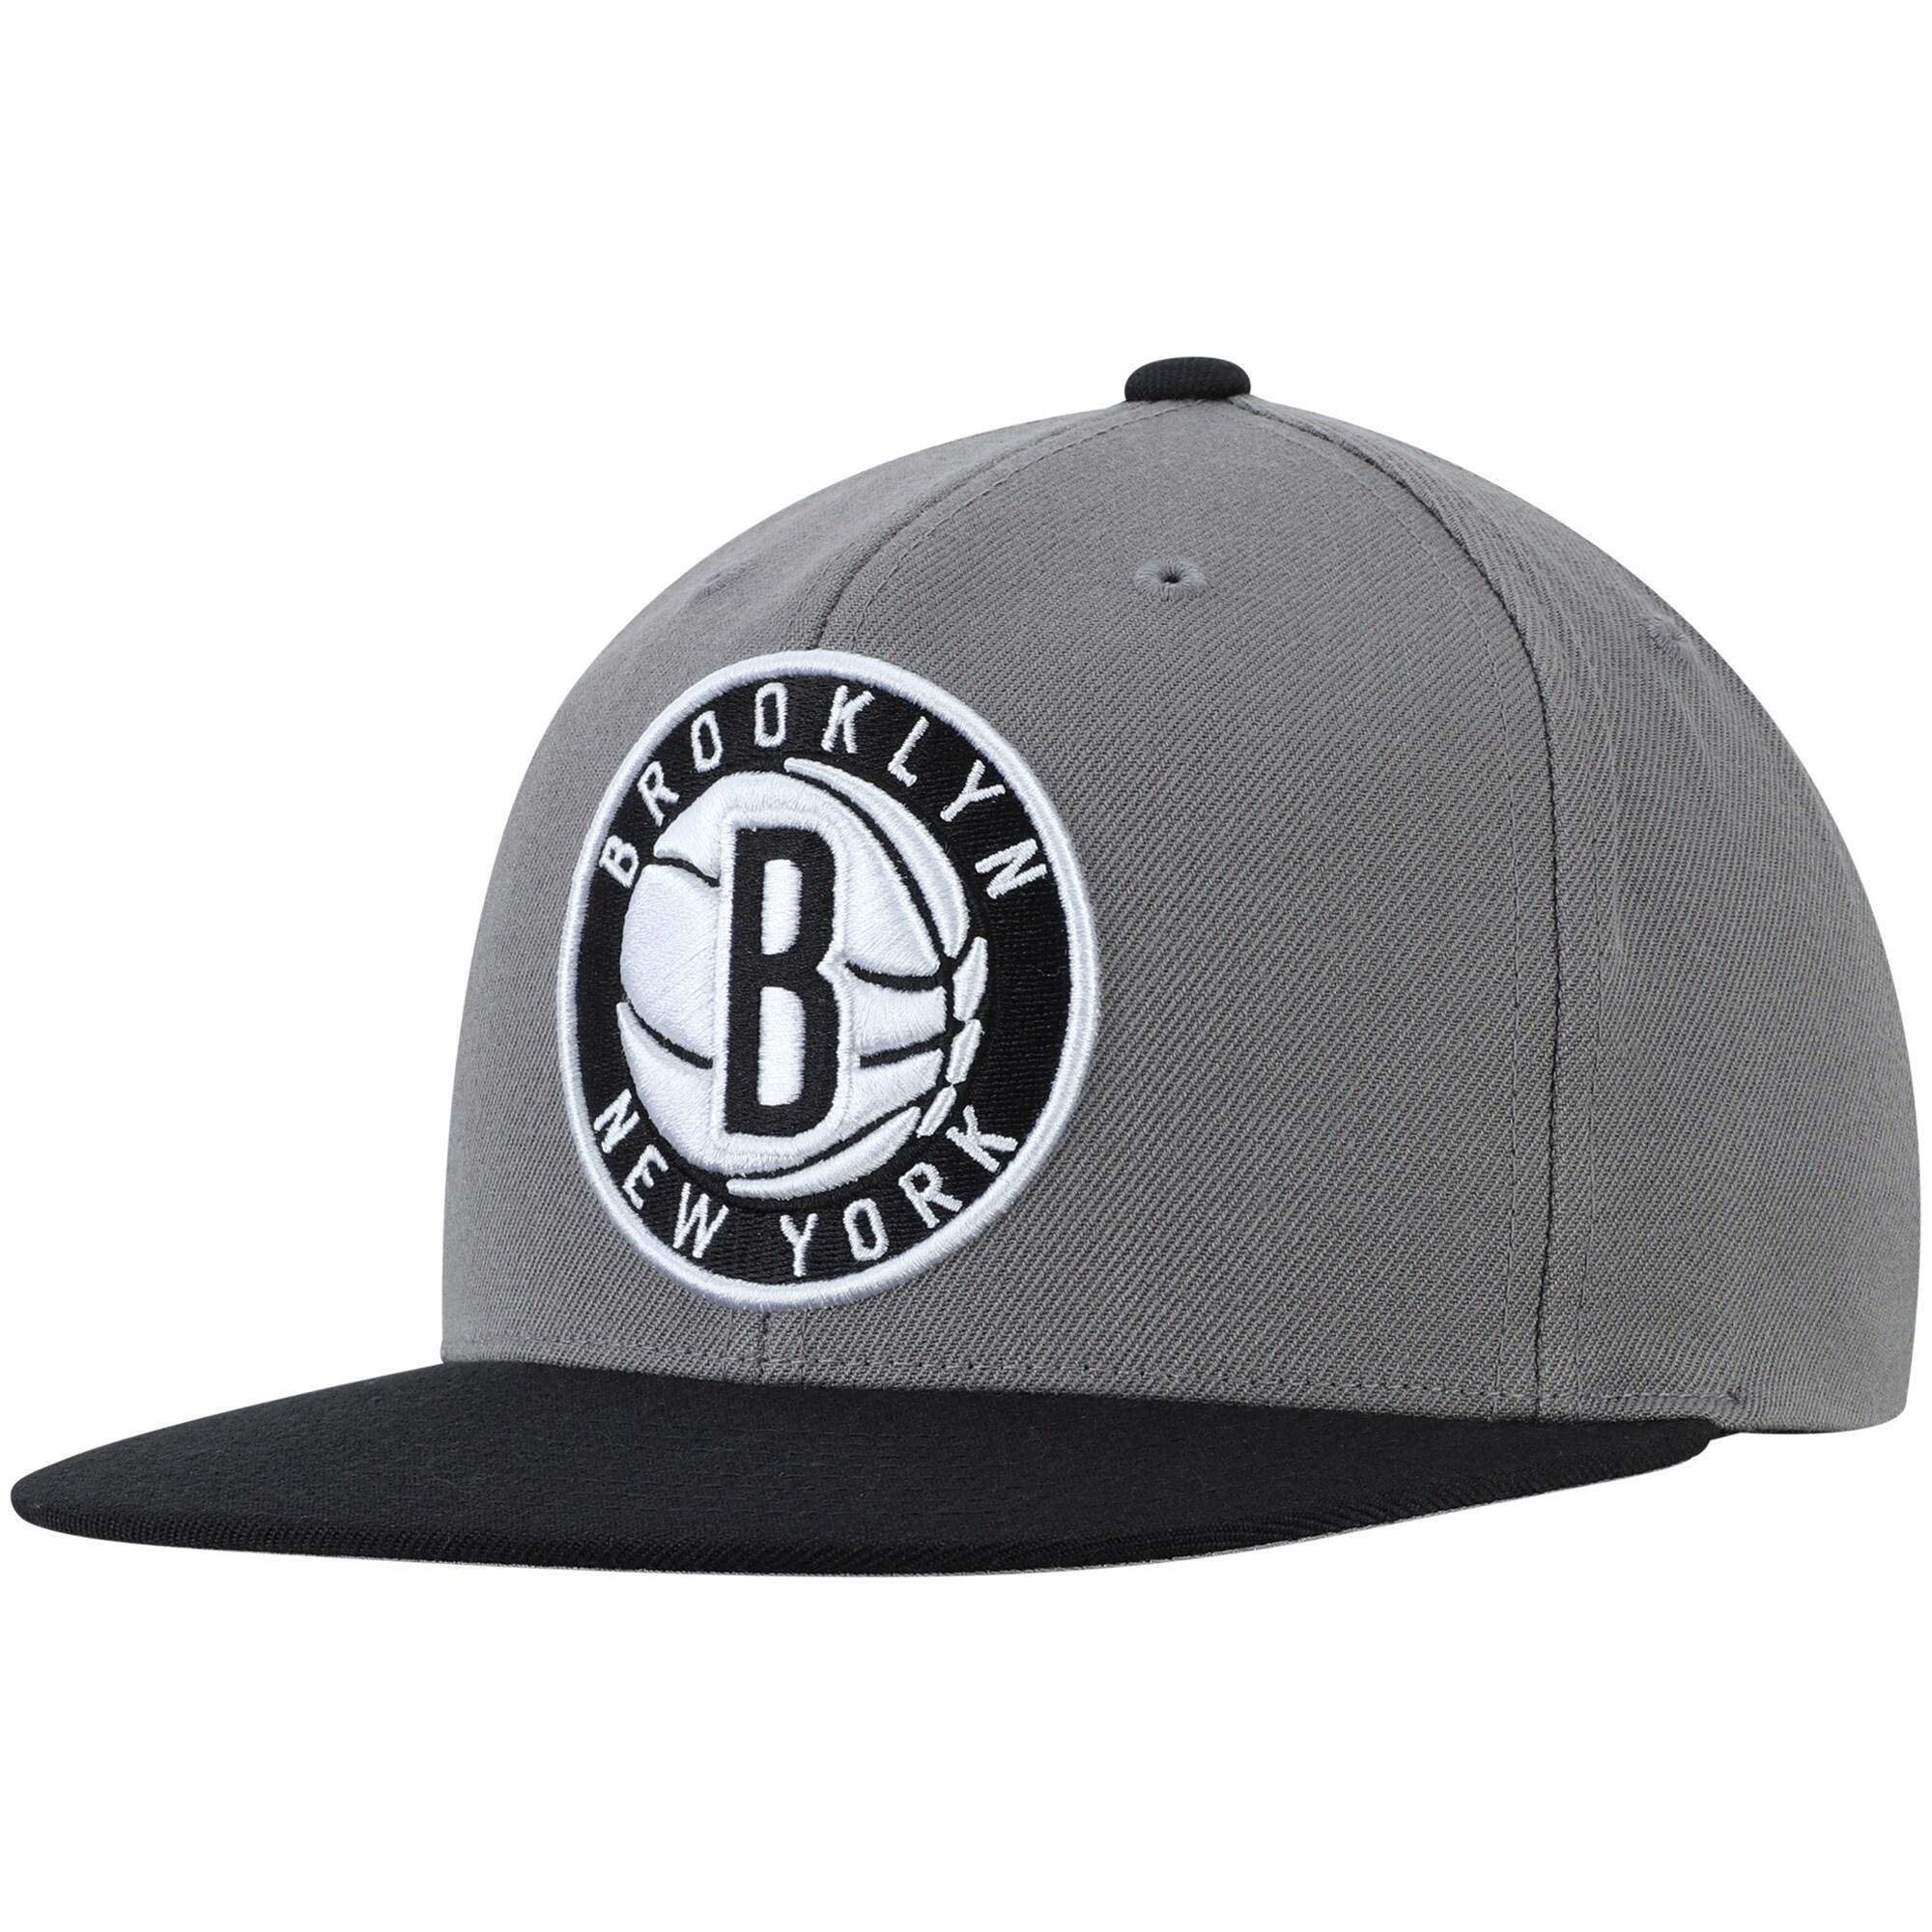 Brooklyn Nets Mitchell & Ness Two-Tone Wool Snapback Hat - Gray/Black